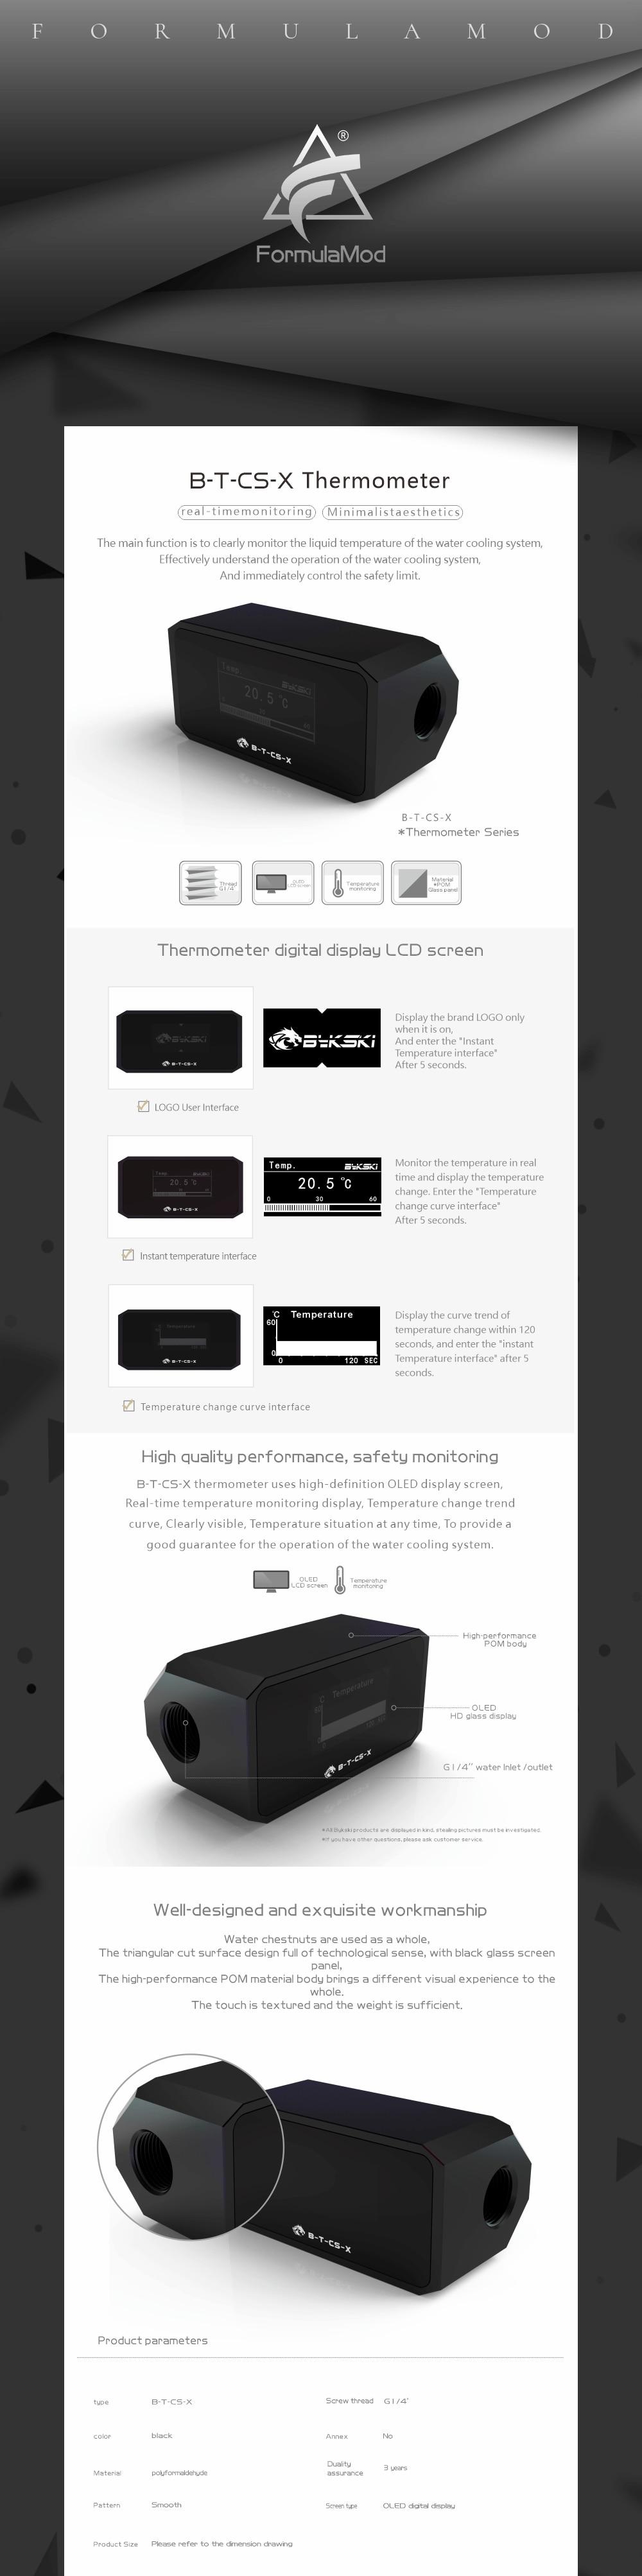 Bykski Water Cooler System Monitor for Temperature Meter / Water Flow OLED Display Double G1/4'' Flow Error Alarm, B-T-CS-X